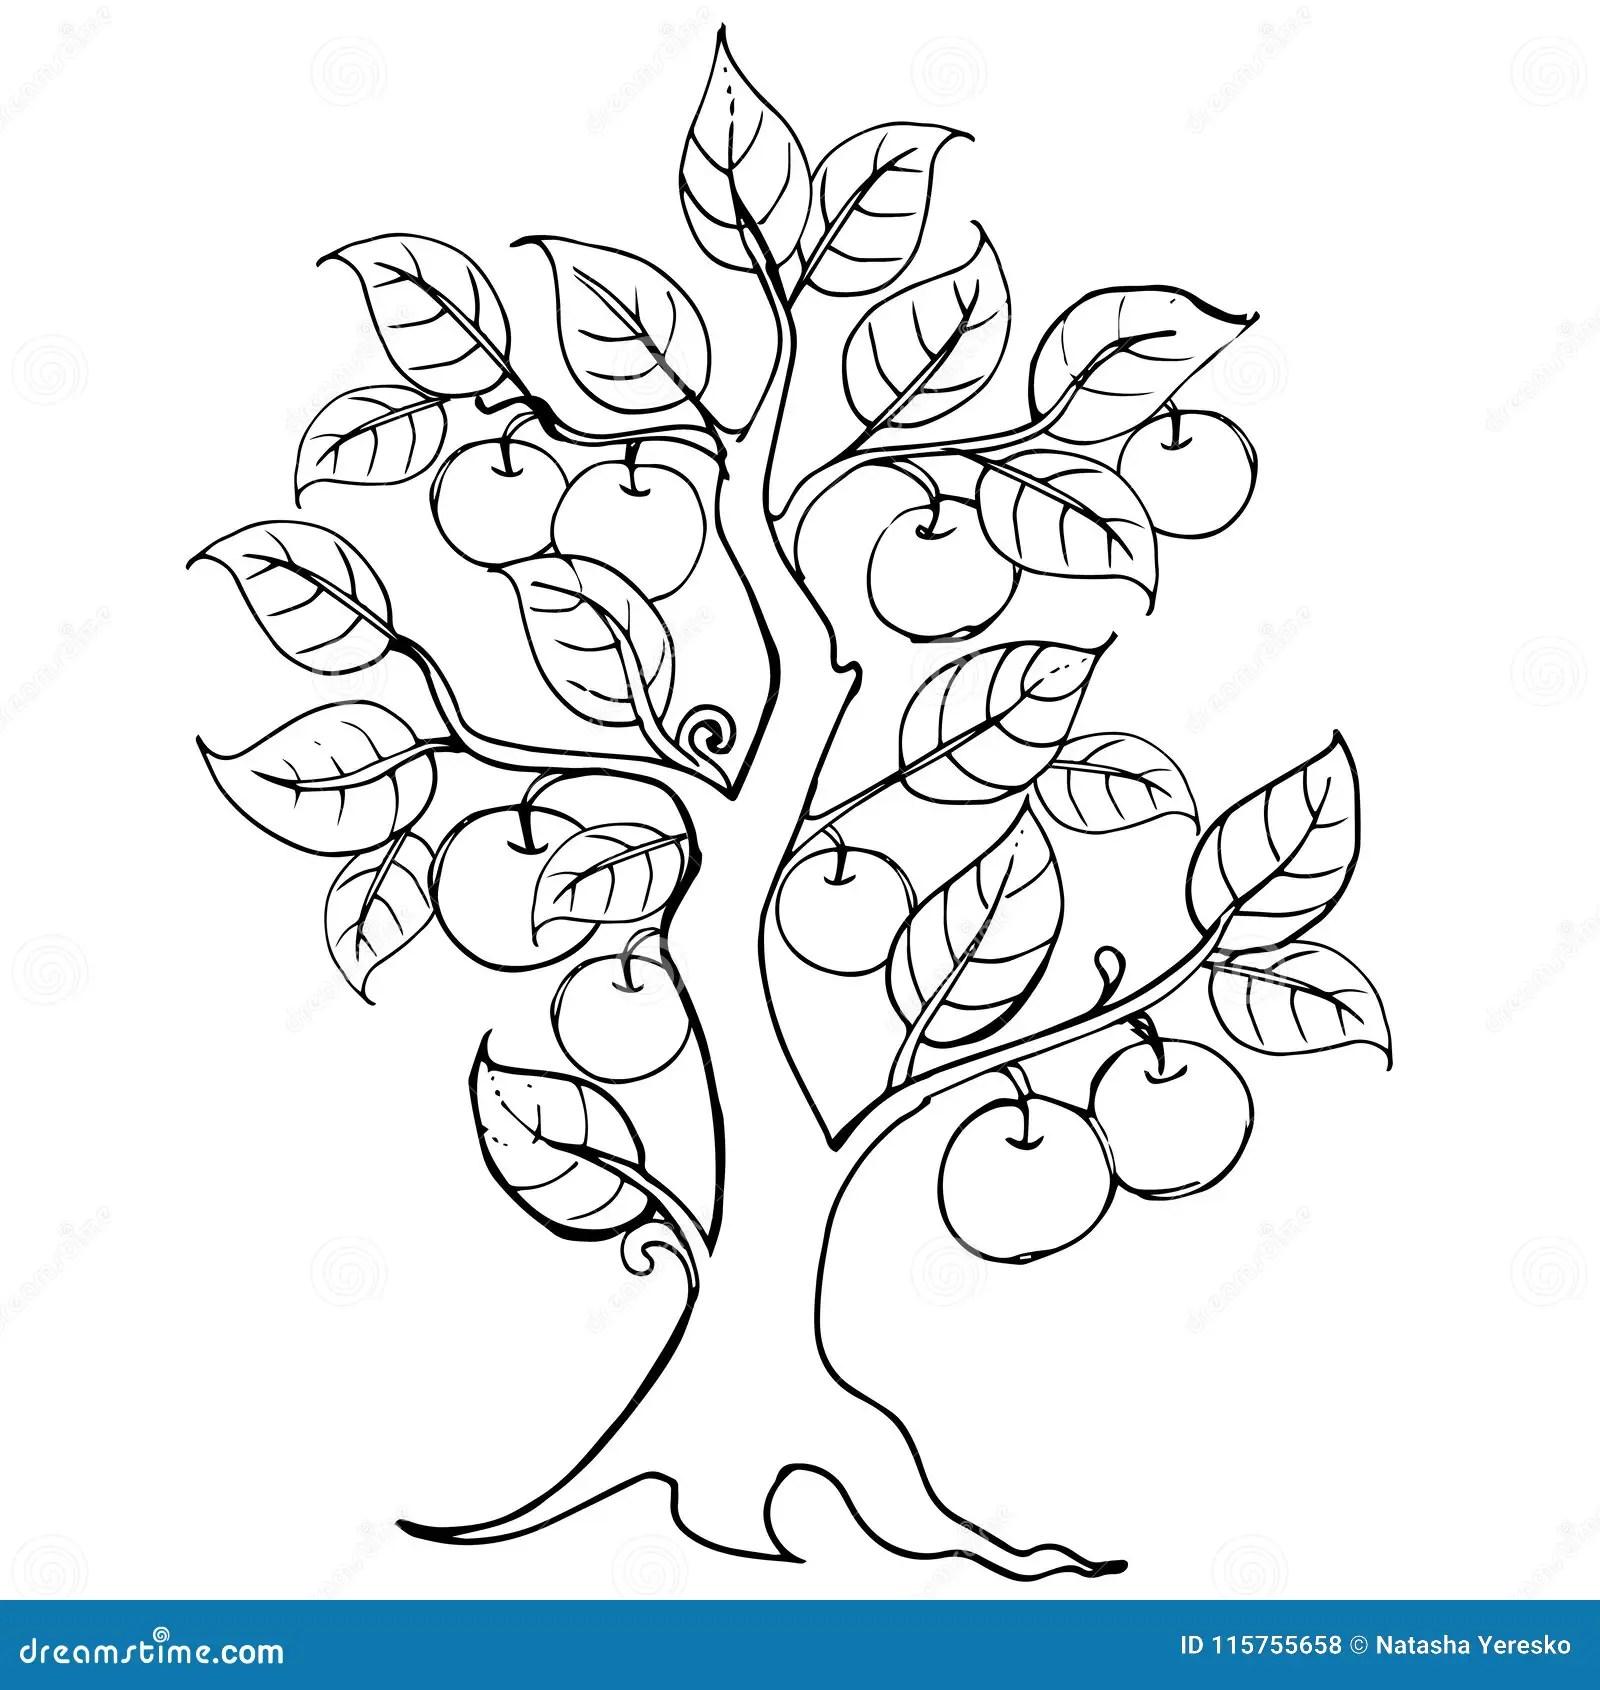 Hands Drawing Apple Tree Vector Artwork Illustration For